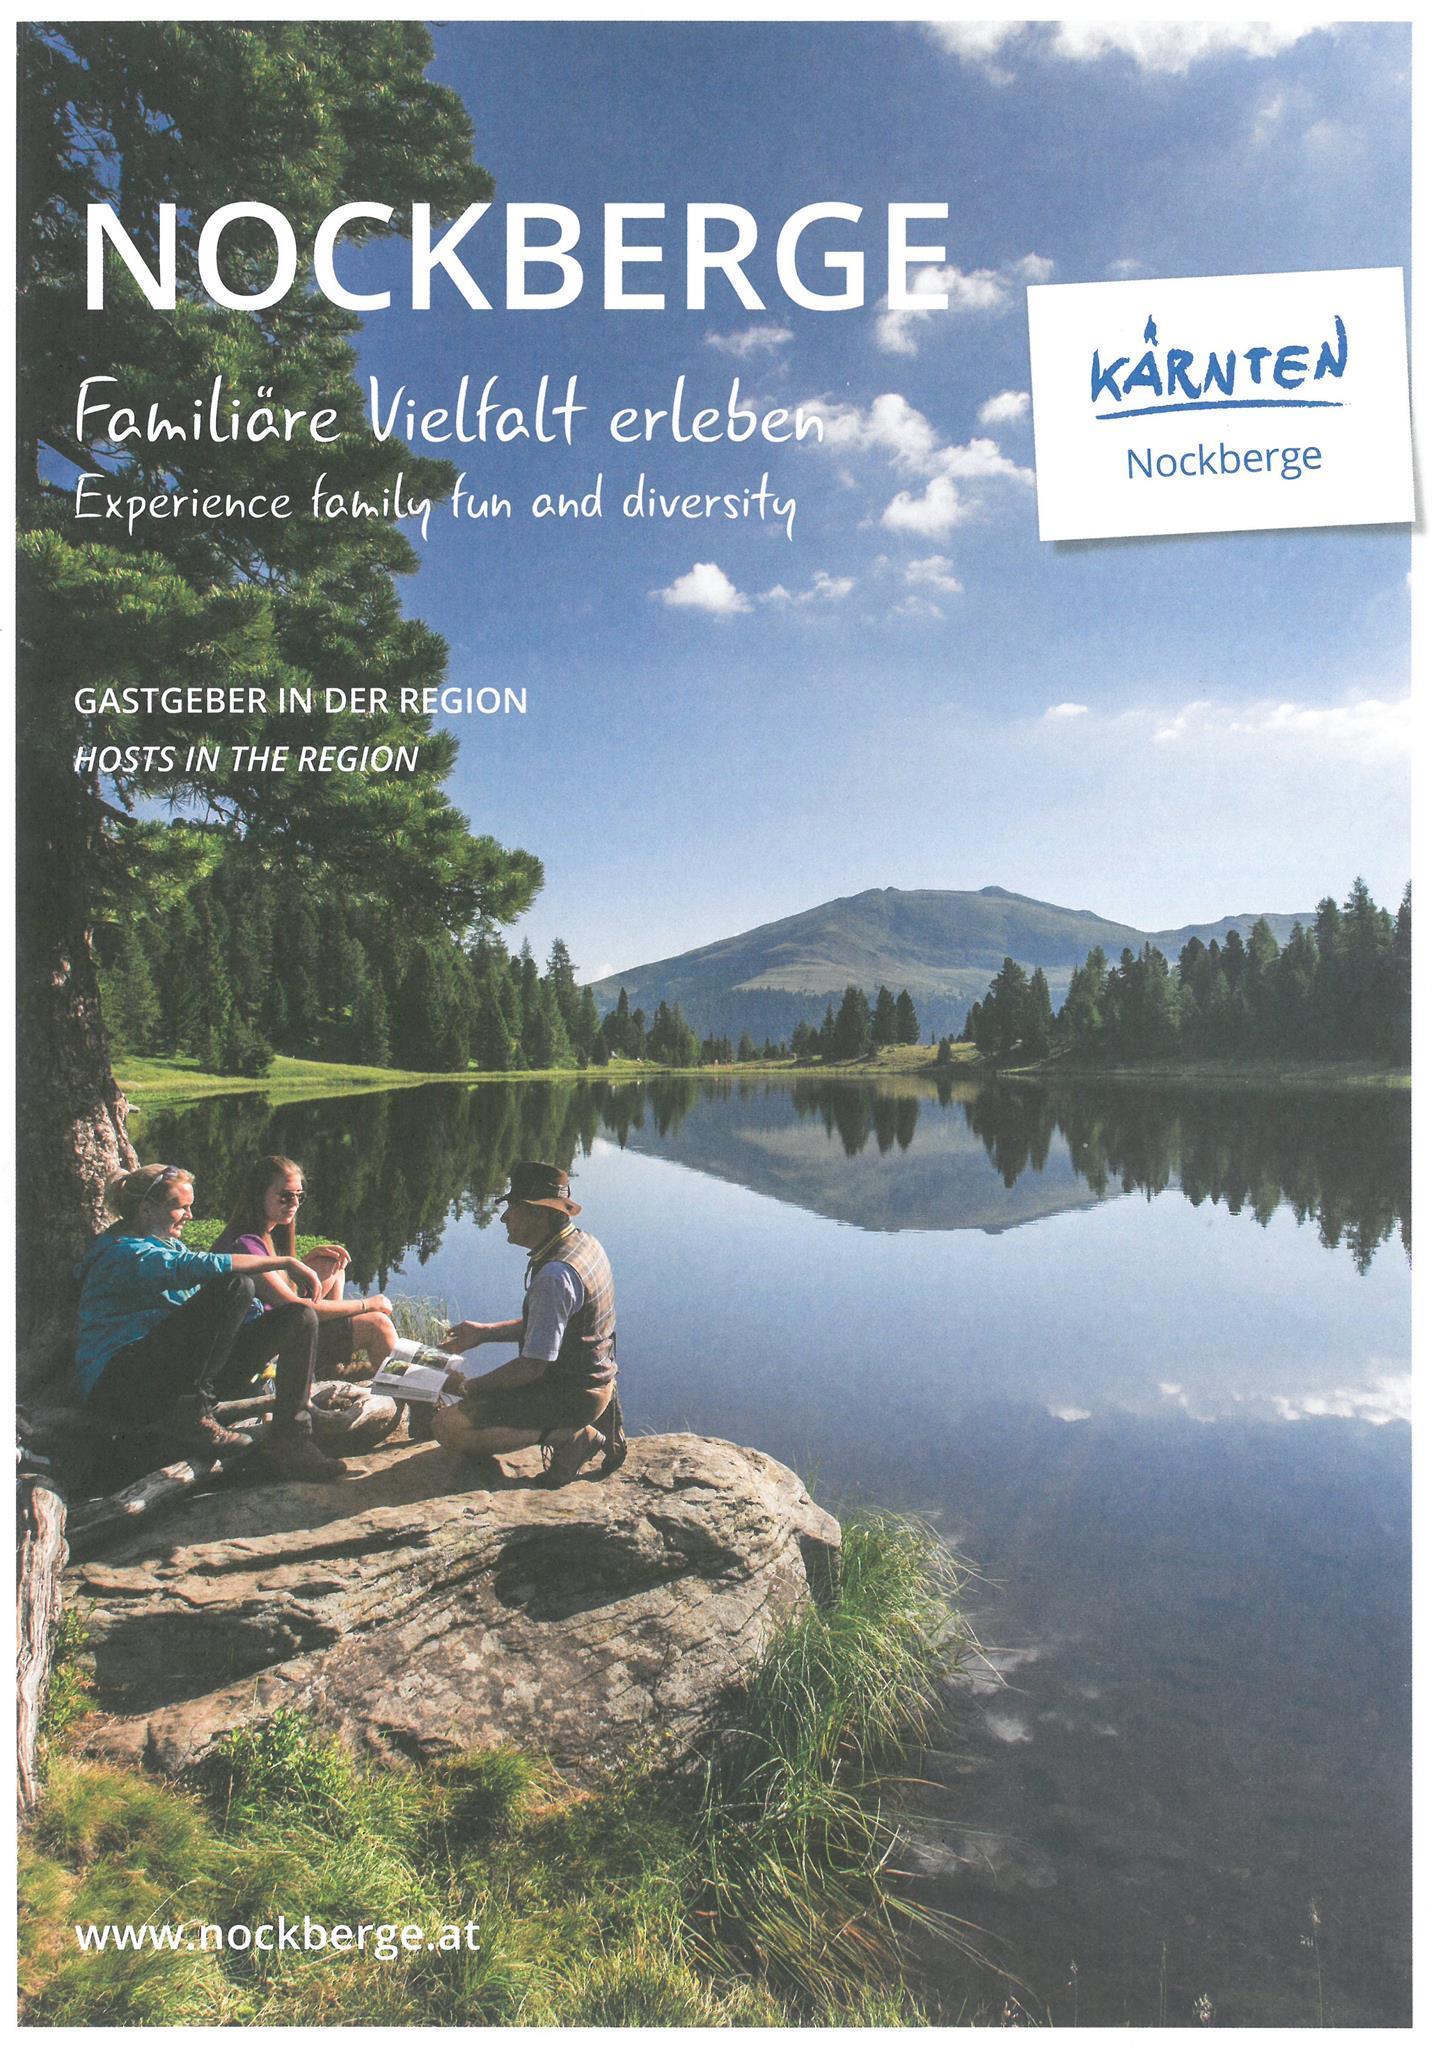 Nockberge(© TourismusregionNockberge)